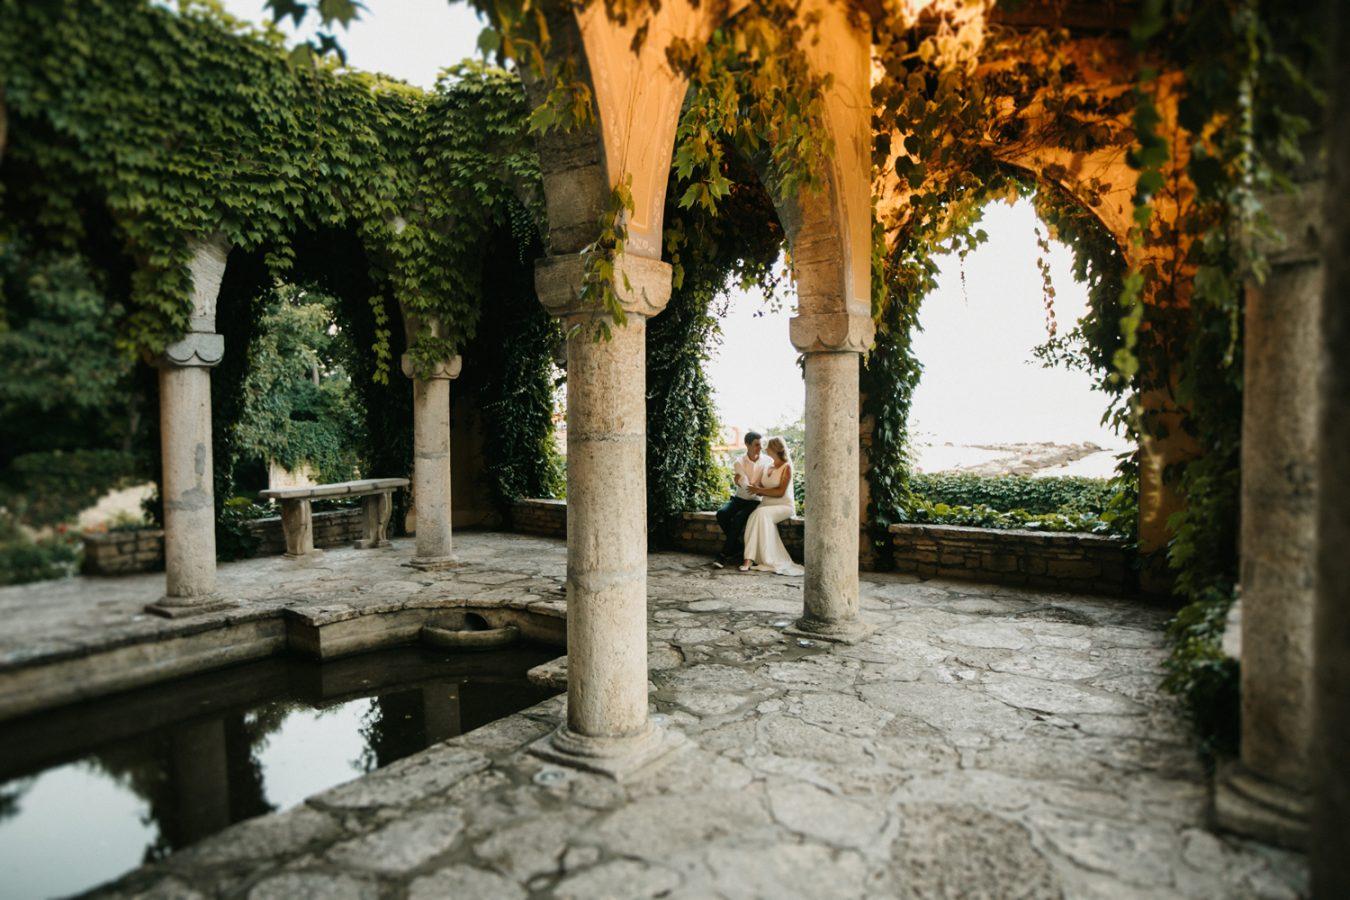 fotograf sibiu bucuresti cluj cununie nunta